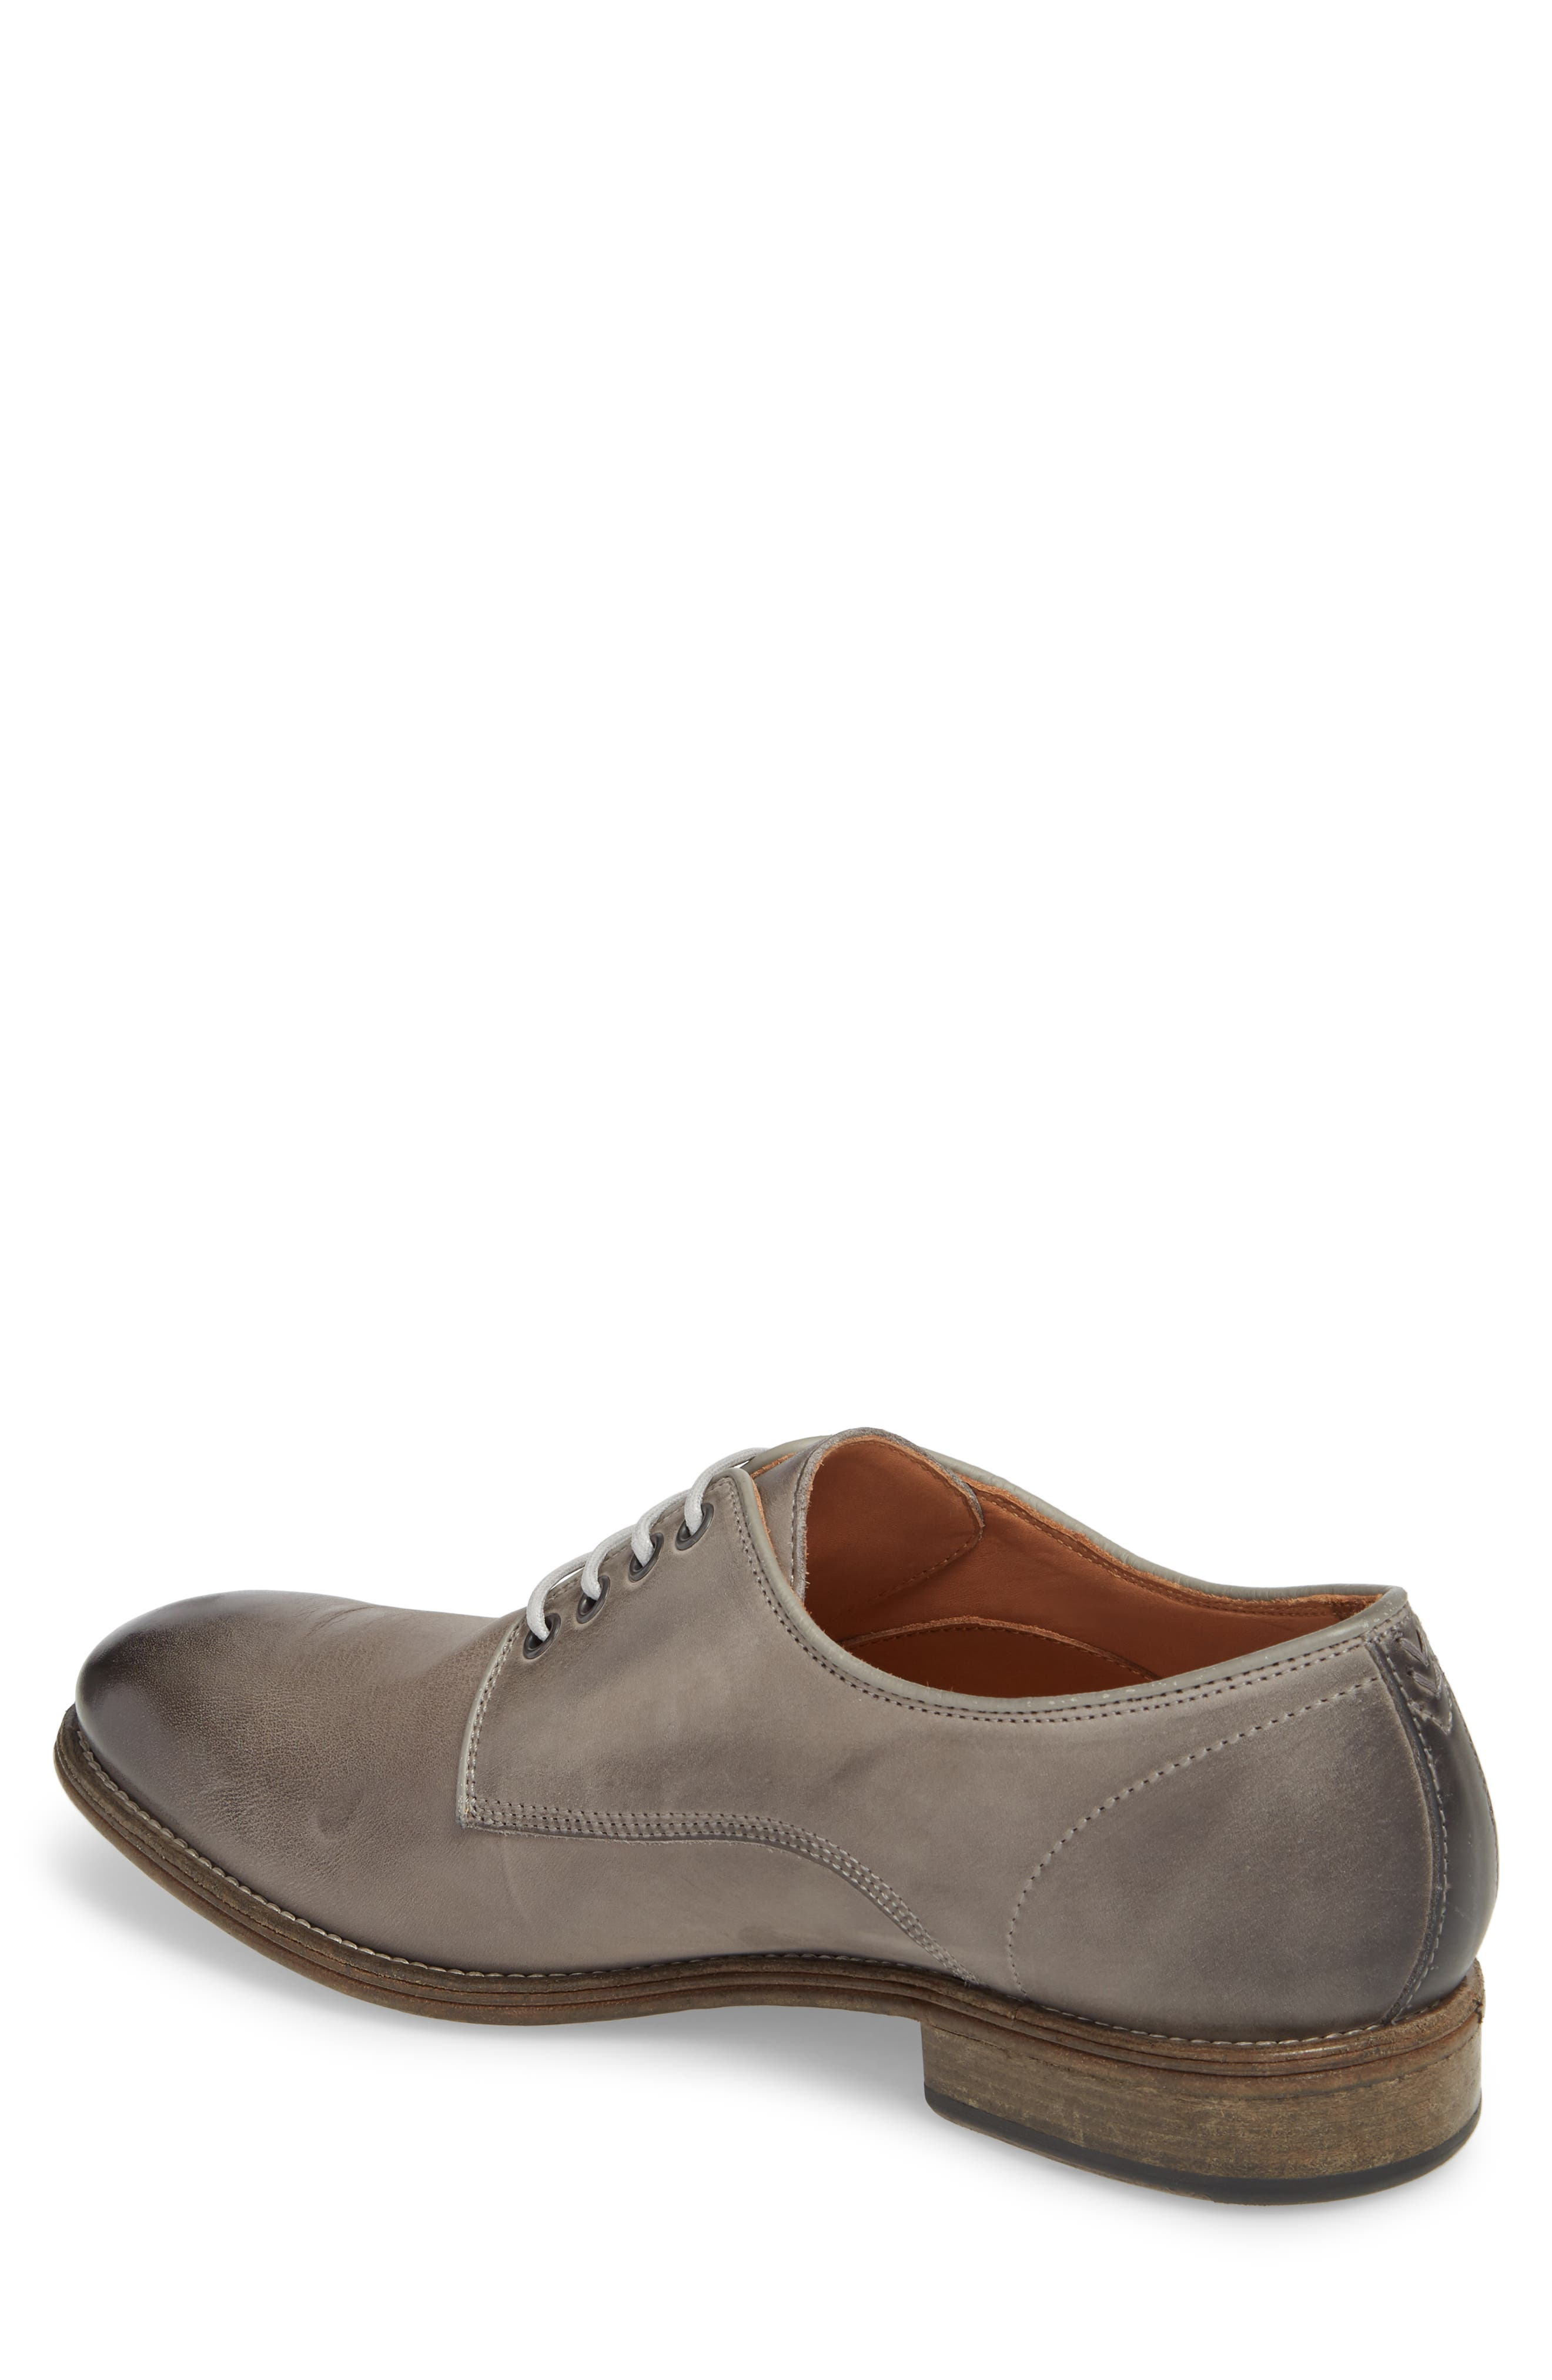 John Varvatos Stanton Plain Toe Derby,                             Alternate thumbnail 2, color,                             Ash Leather